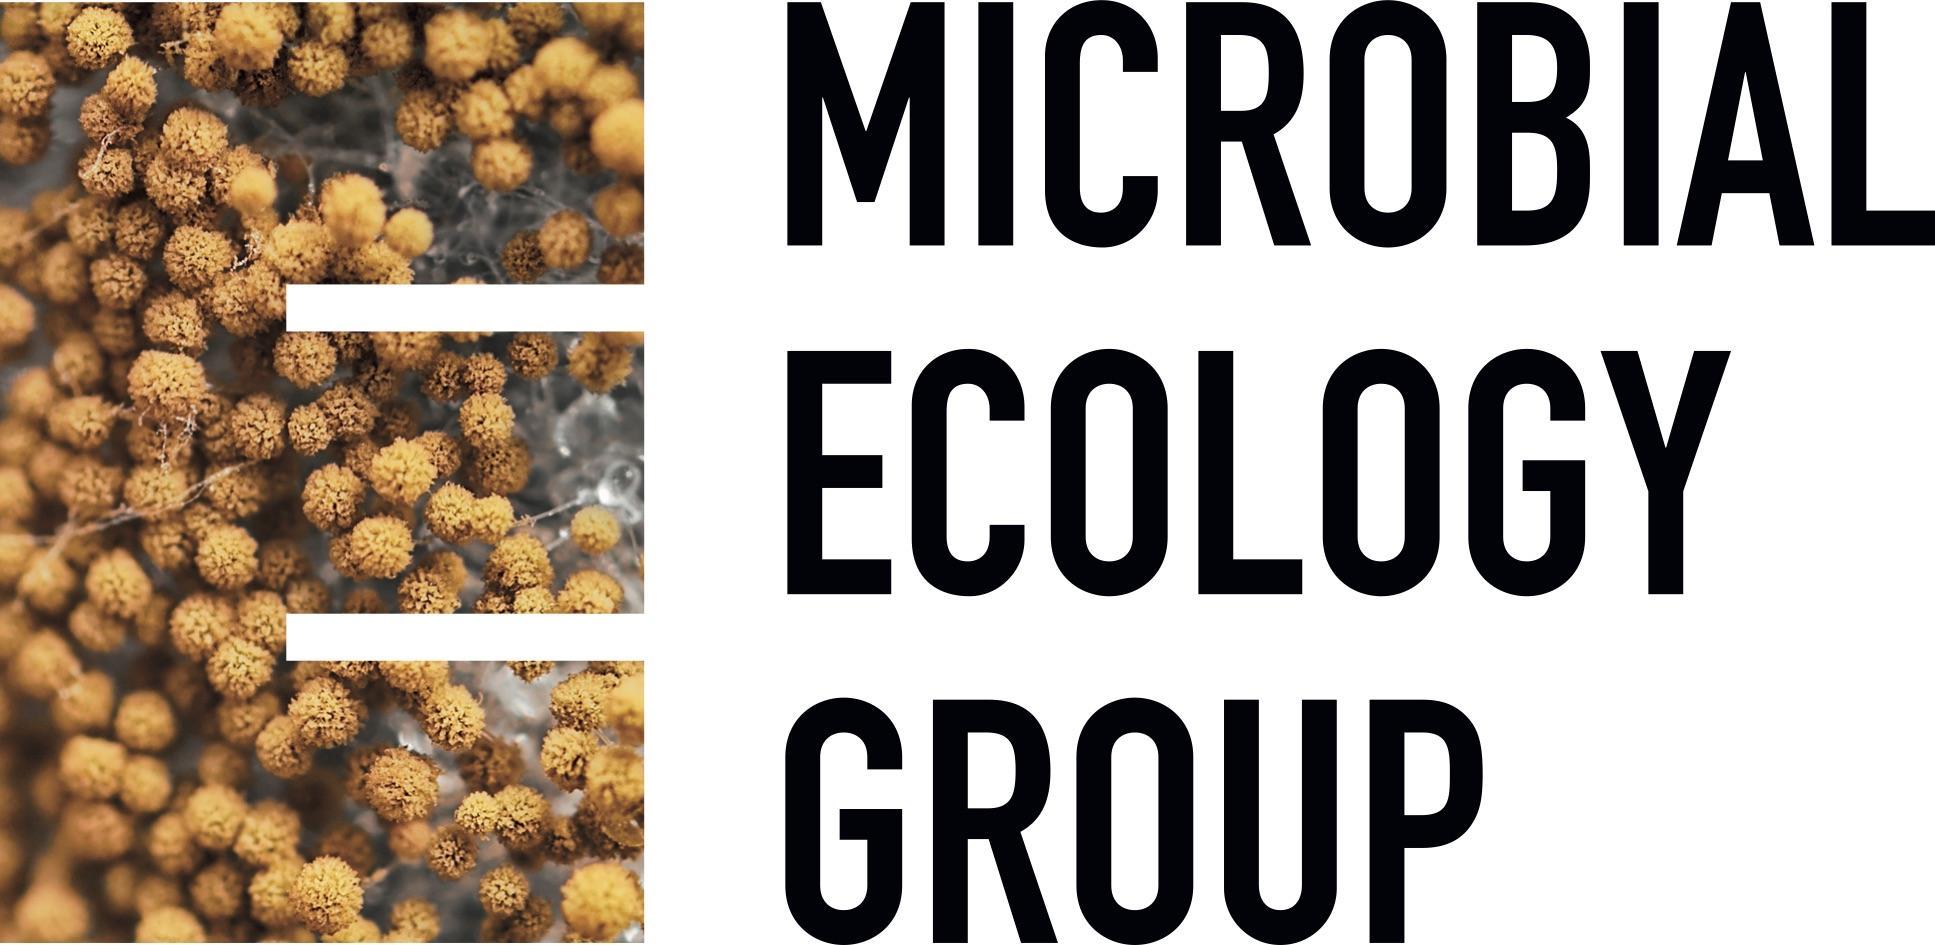 BES Microbial Ecology Symposium, Publishing Workshop, Bioinformatics Course